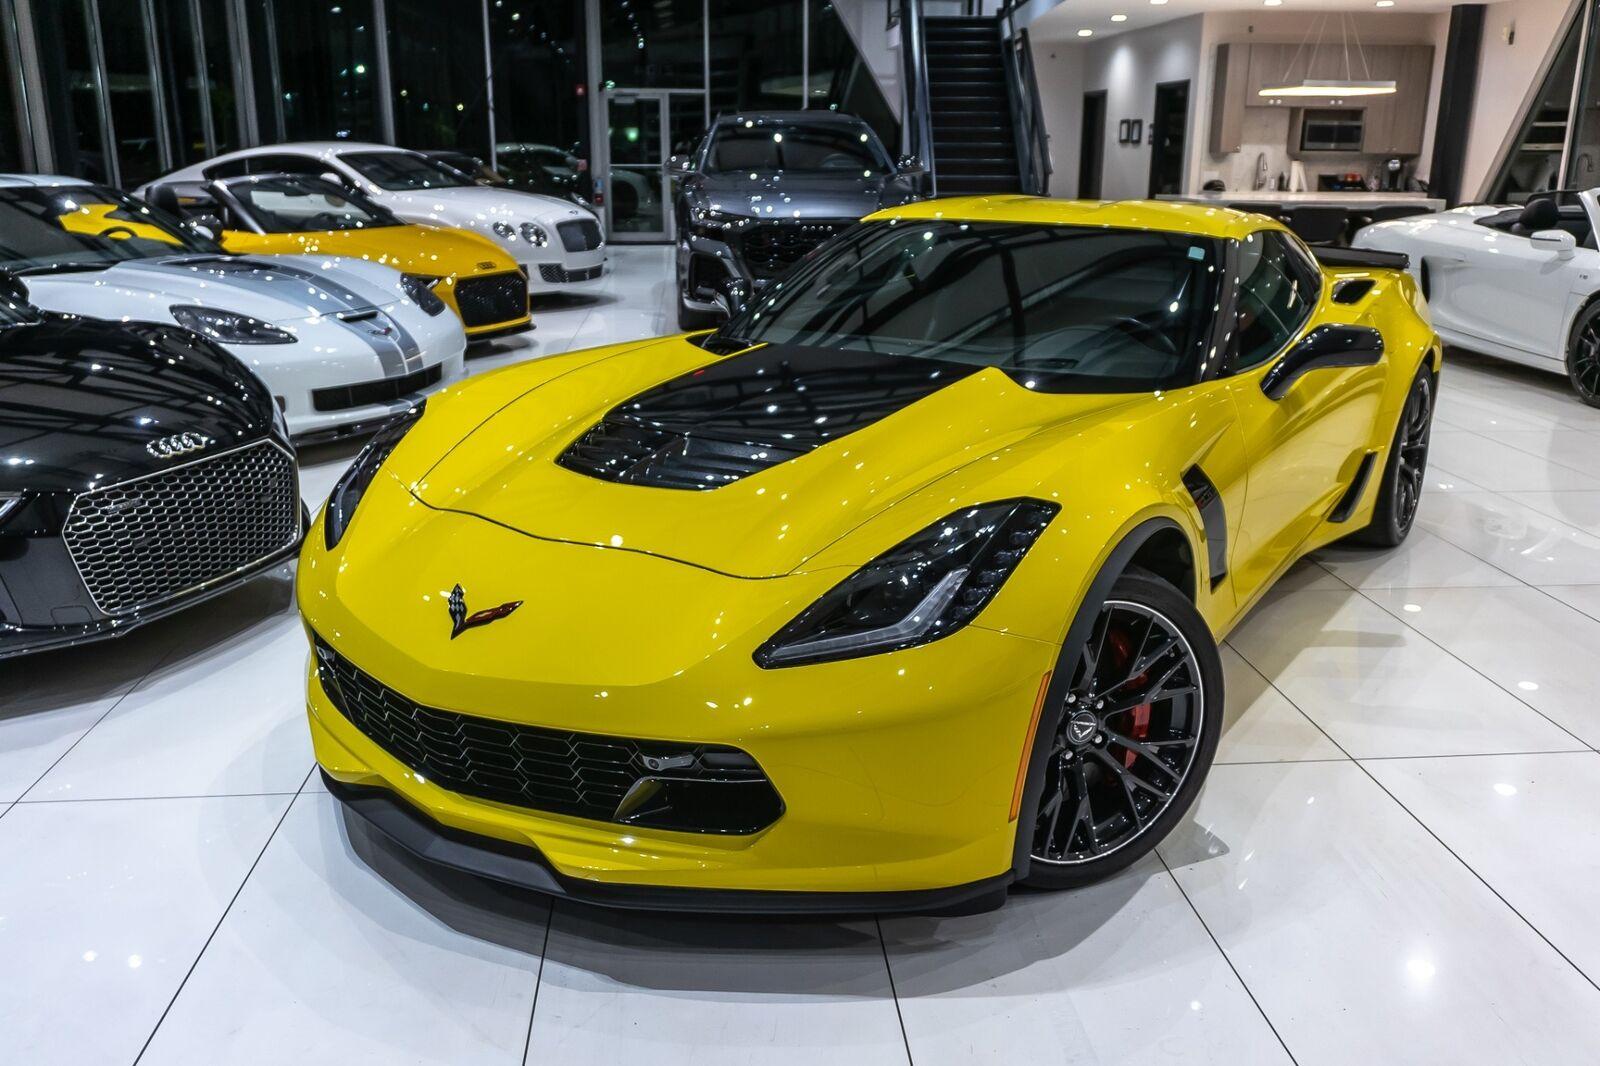 2016 Yellow Chevrolet Corvette Coupe 2LZ   C7 Corvette Photo 4